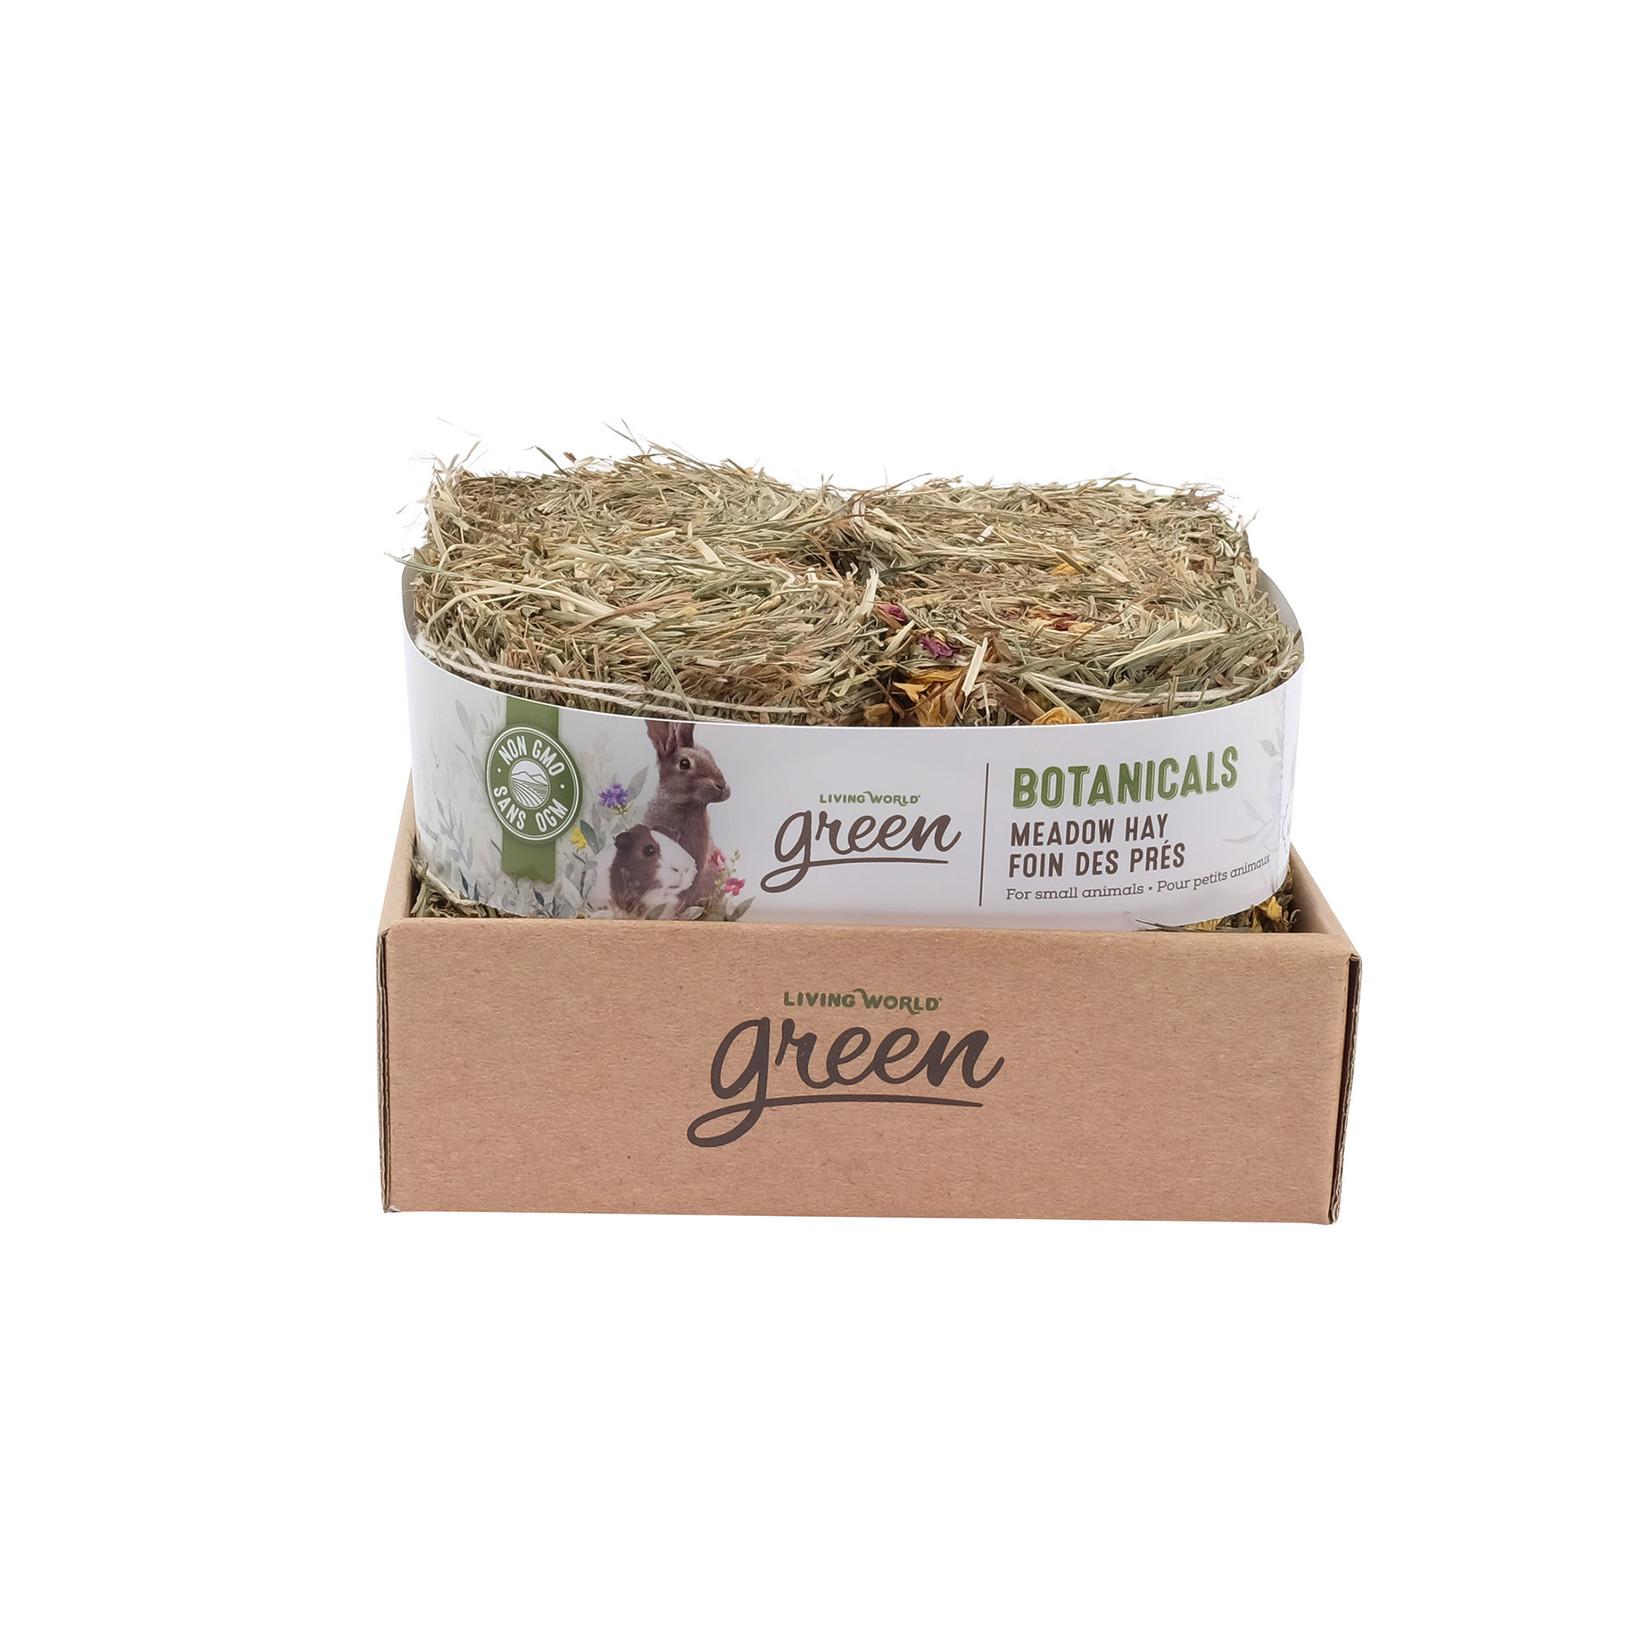 Living World Green Green Botanicals Meadow Hay Bale - Herb & Flower Mix - 4 pack - 150 g each